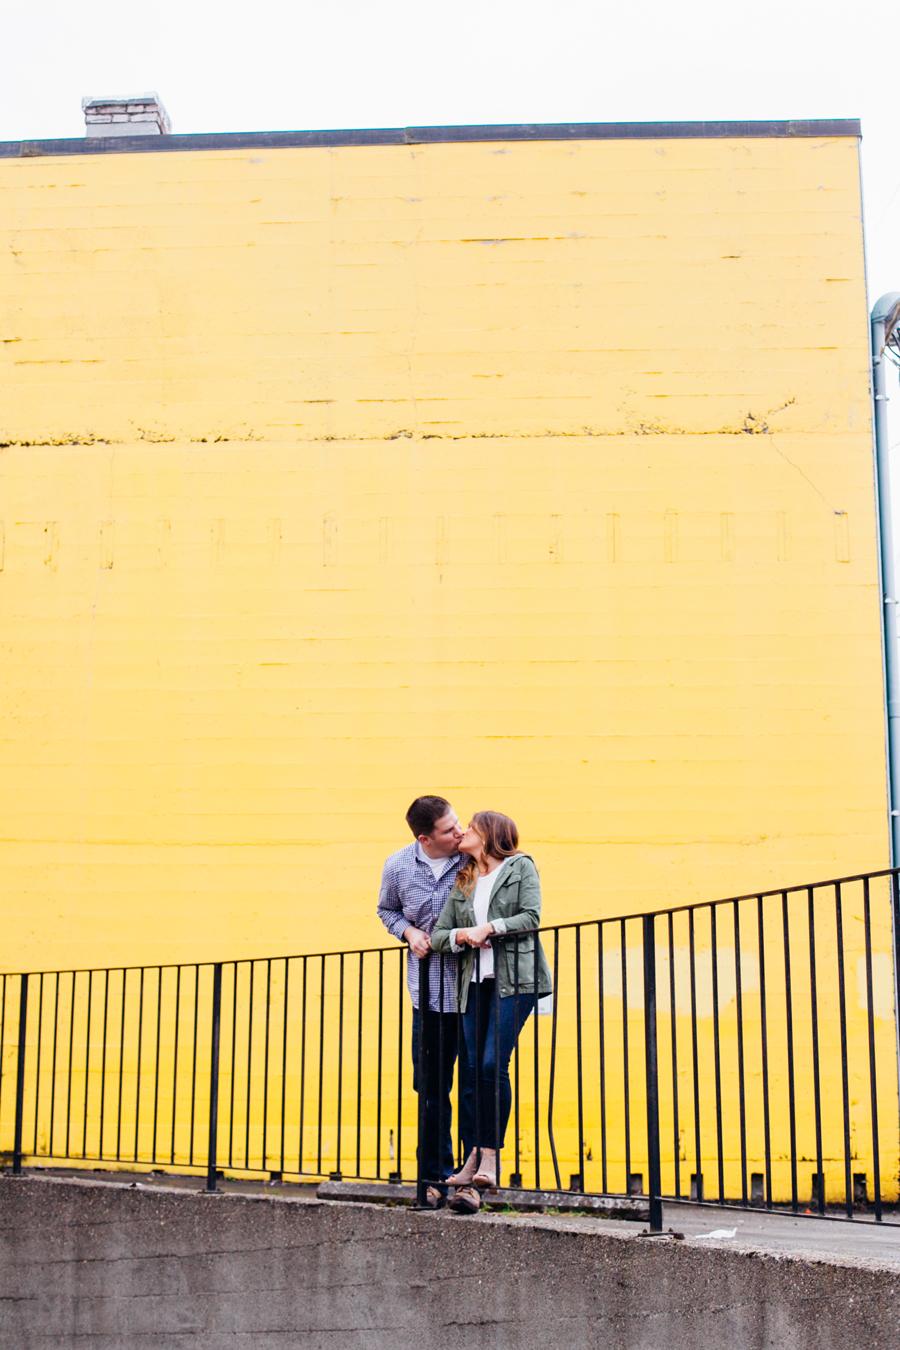 014-bellingham-engagement-photographer-photo-katheryn-moran-lindseyjames.jpg